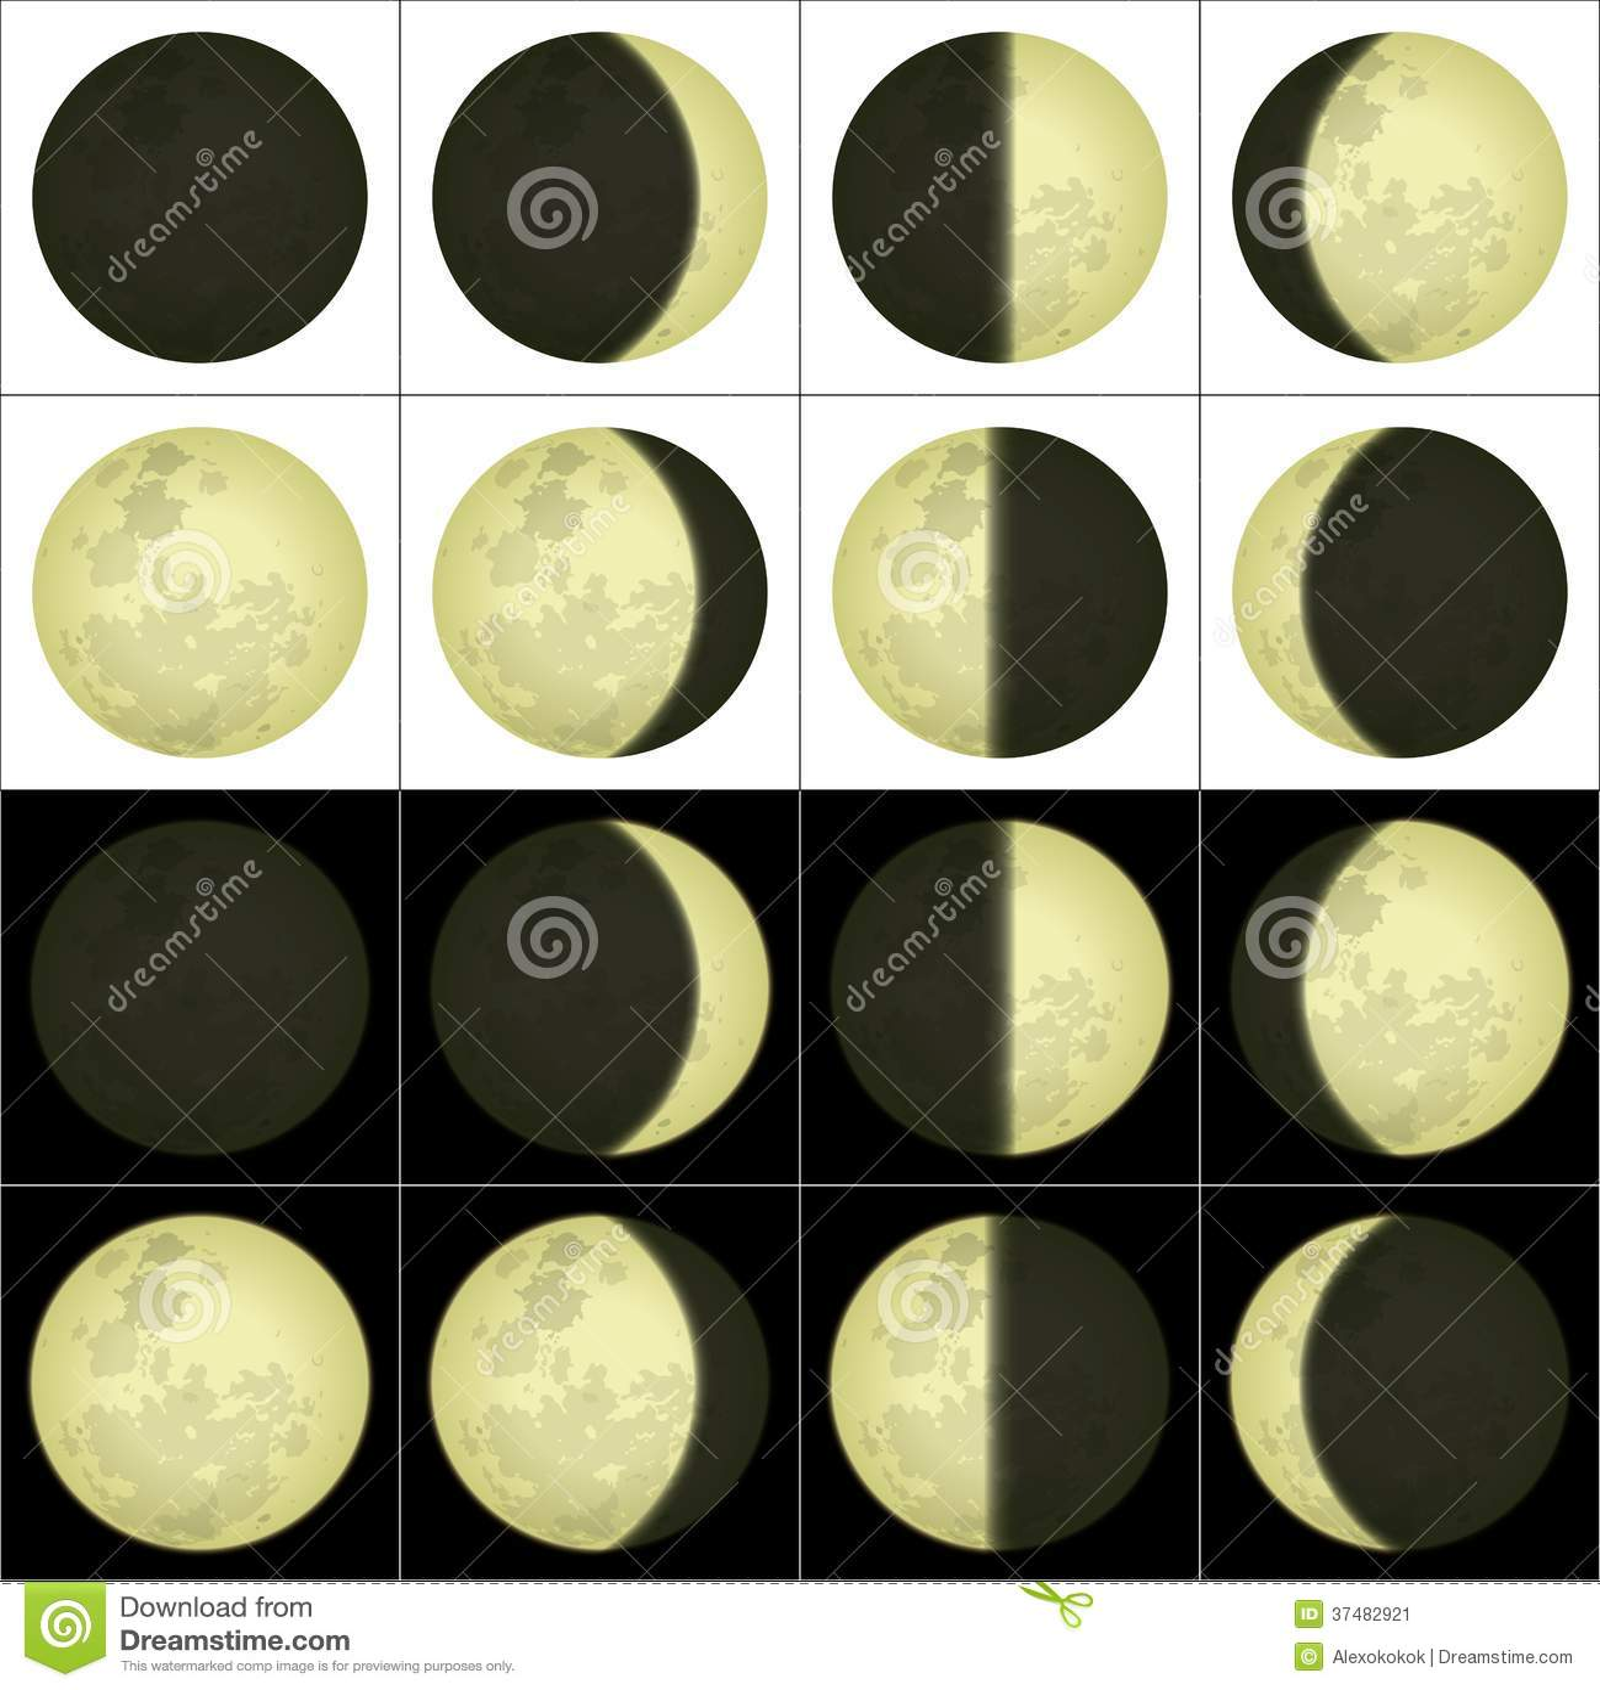 Moon Calendar Illustration : Moon phases set stock image